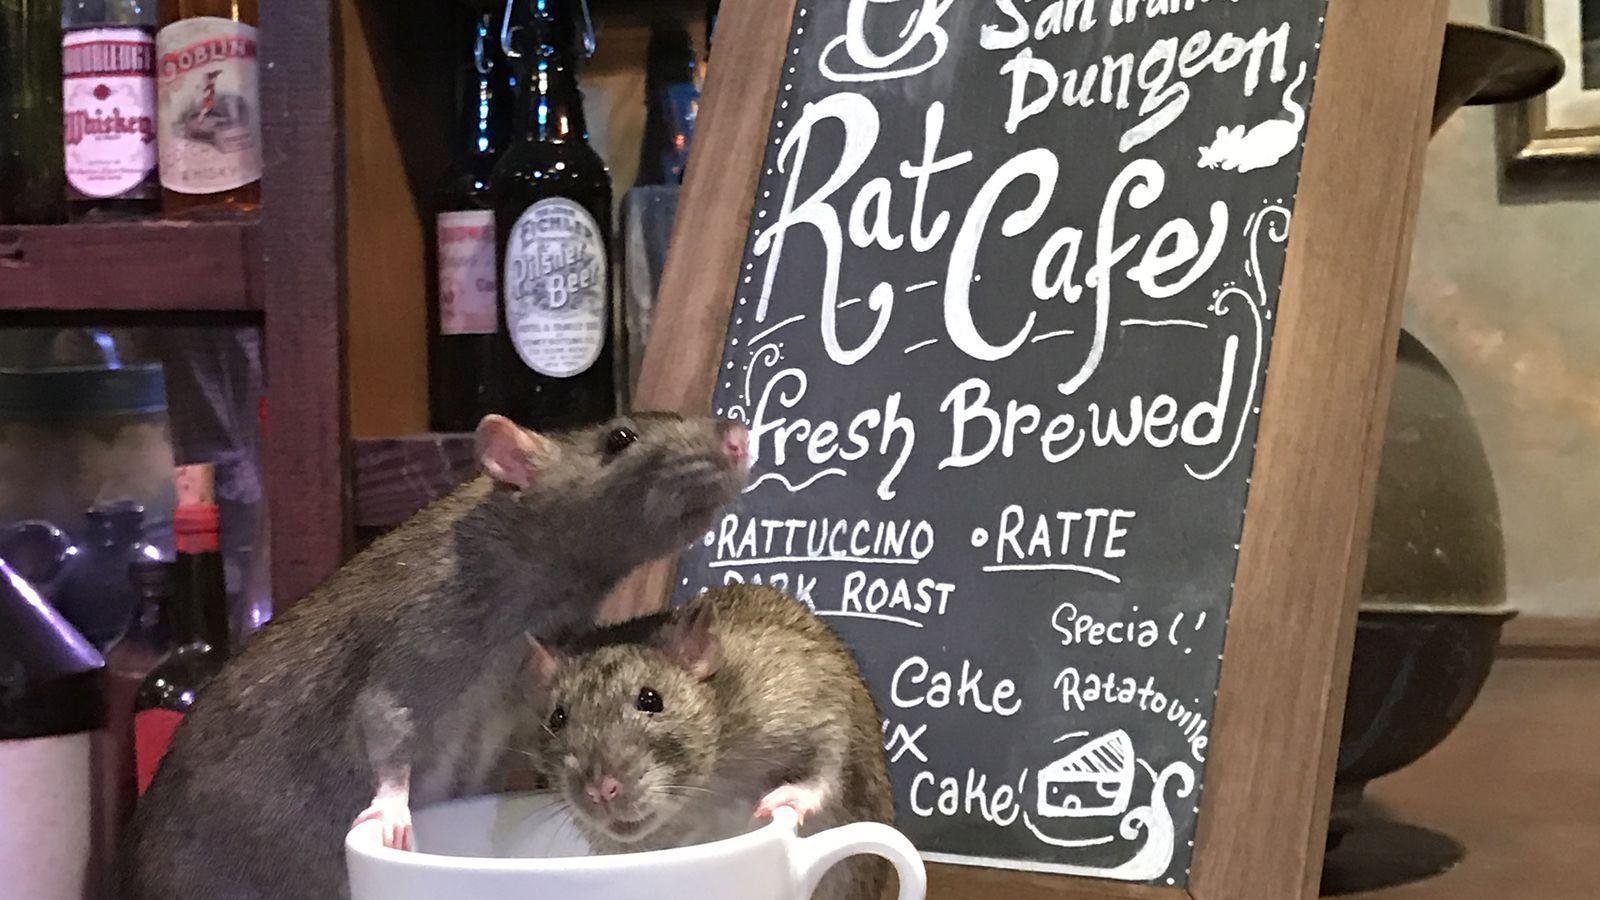 The Rat Cafe San Francisco